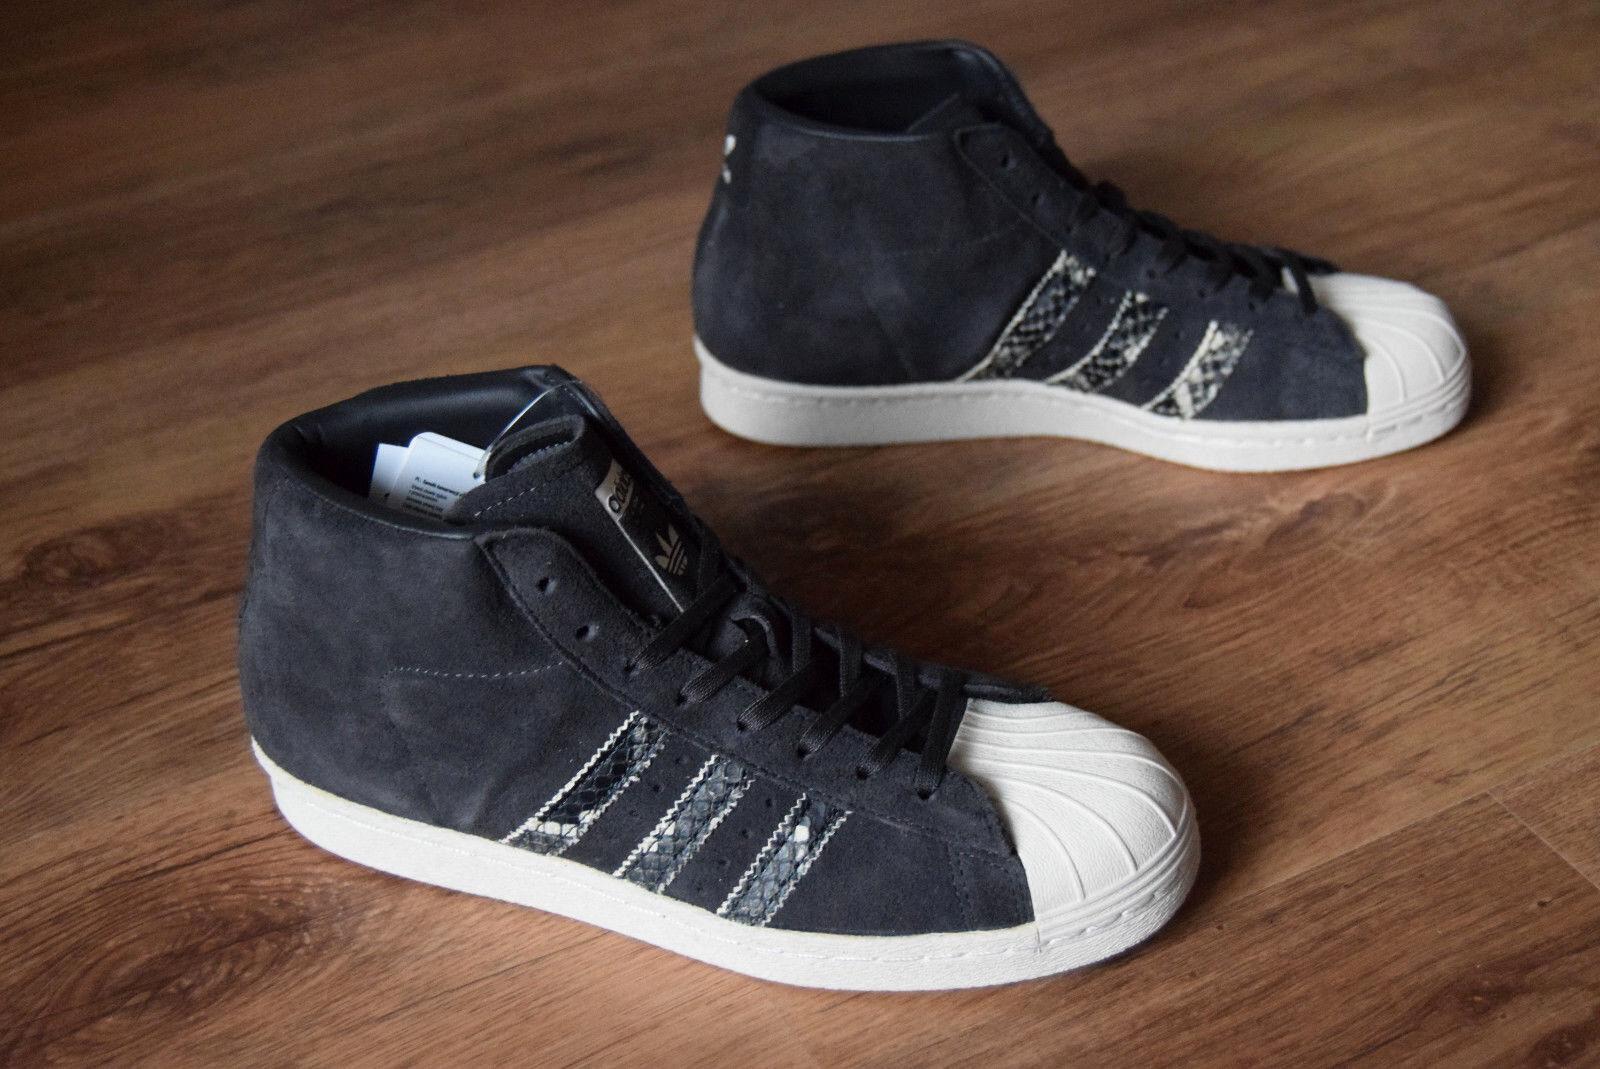 Adidas Promodel W 36 37 38 39 40 41 42 BB5032 Gazelle Stan Smith Superstar